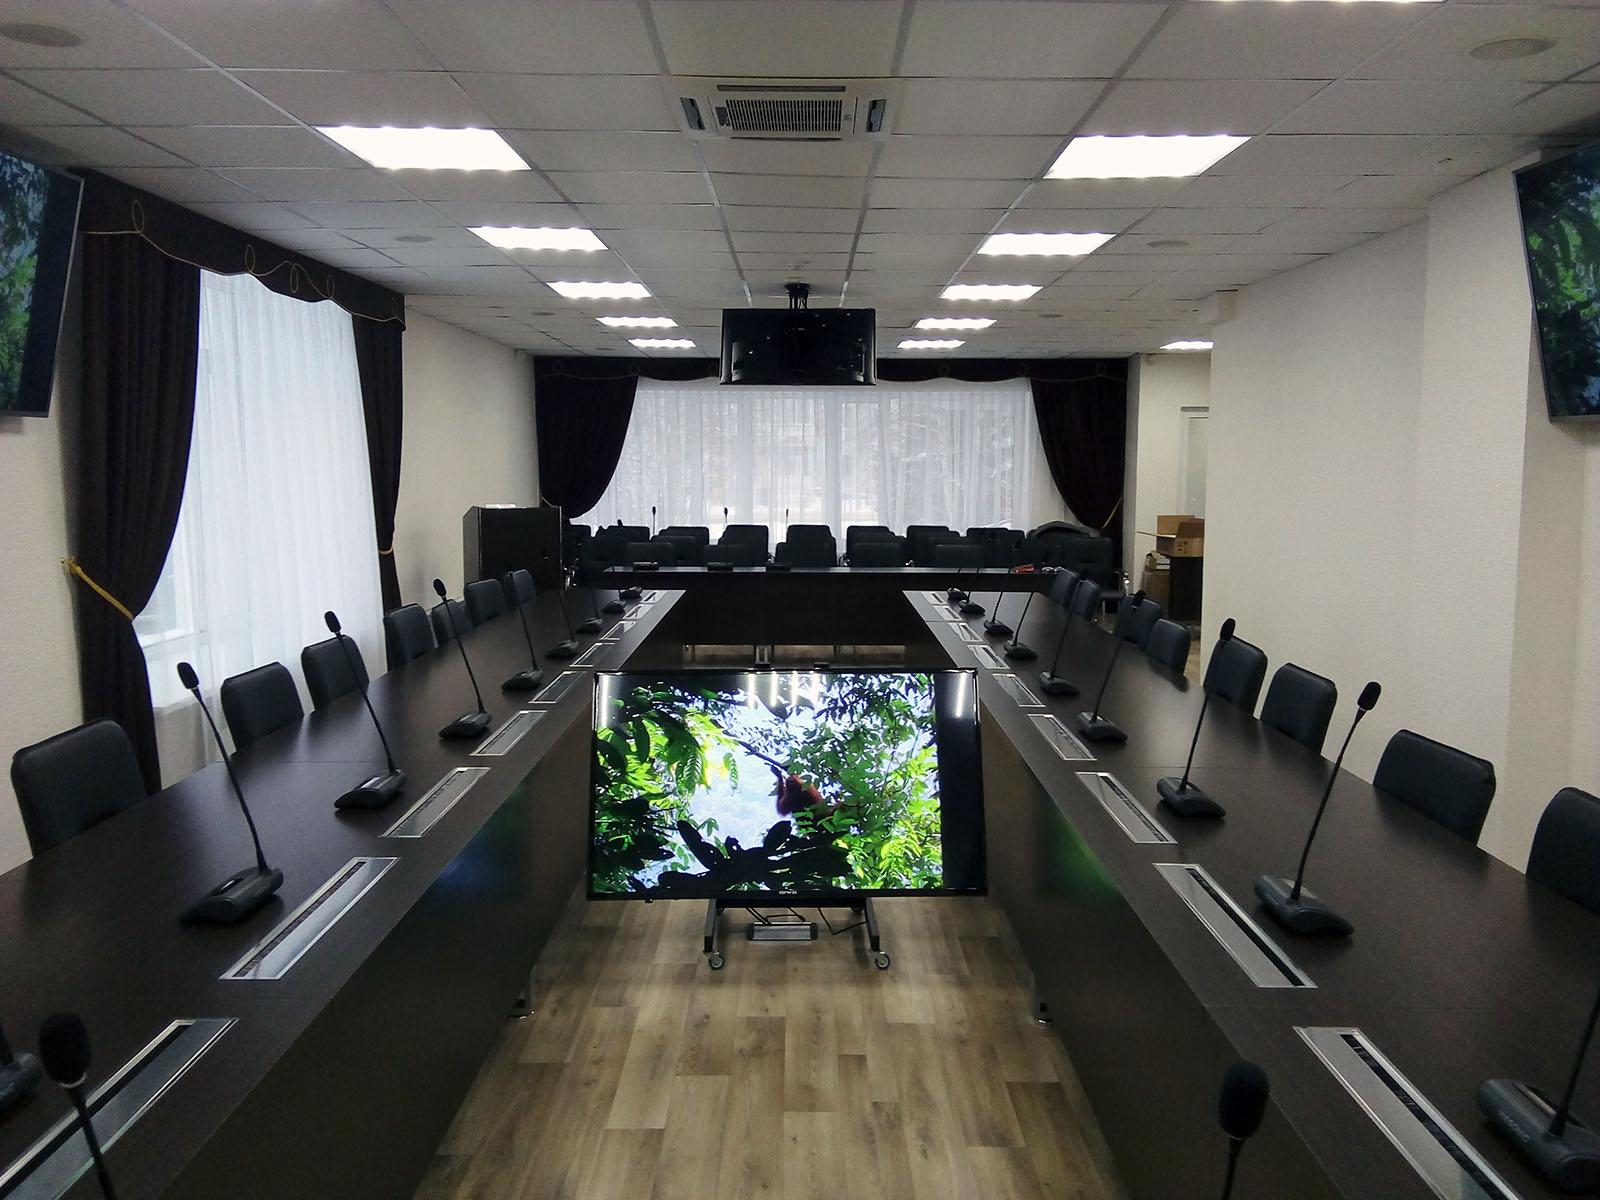 Зал заседаний Администрации города Мегион. Проект РИВА.